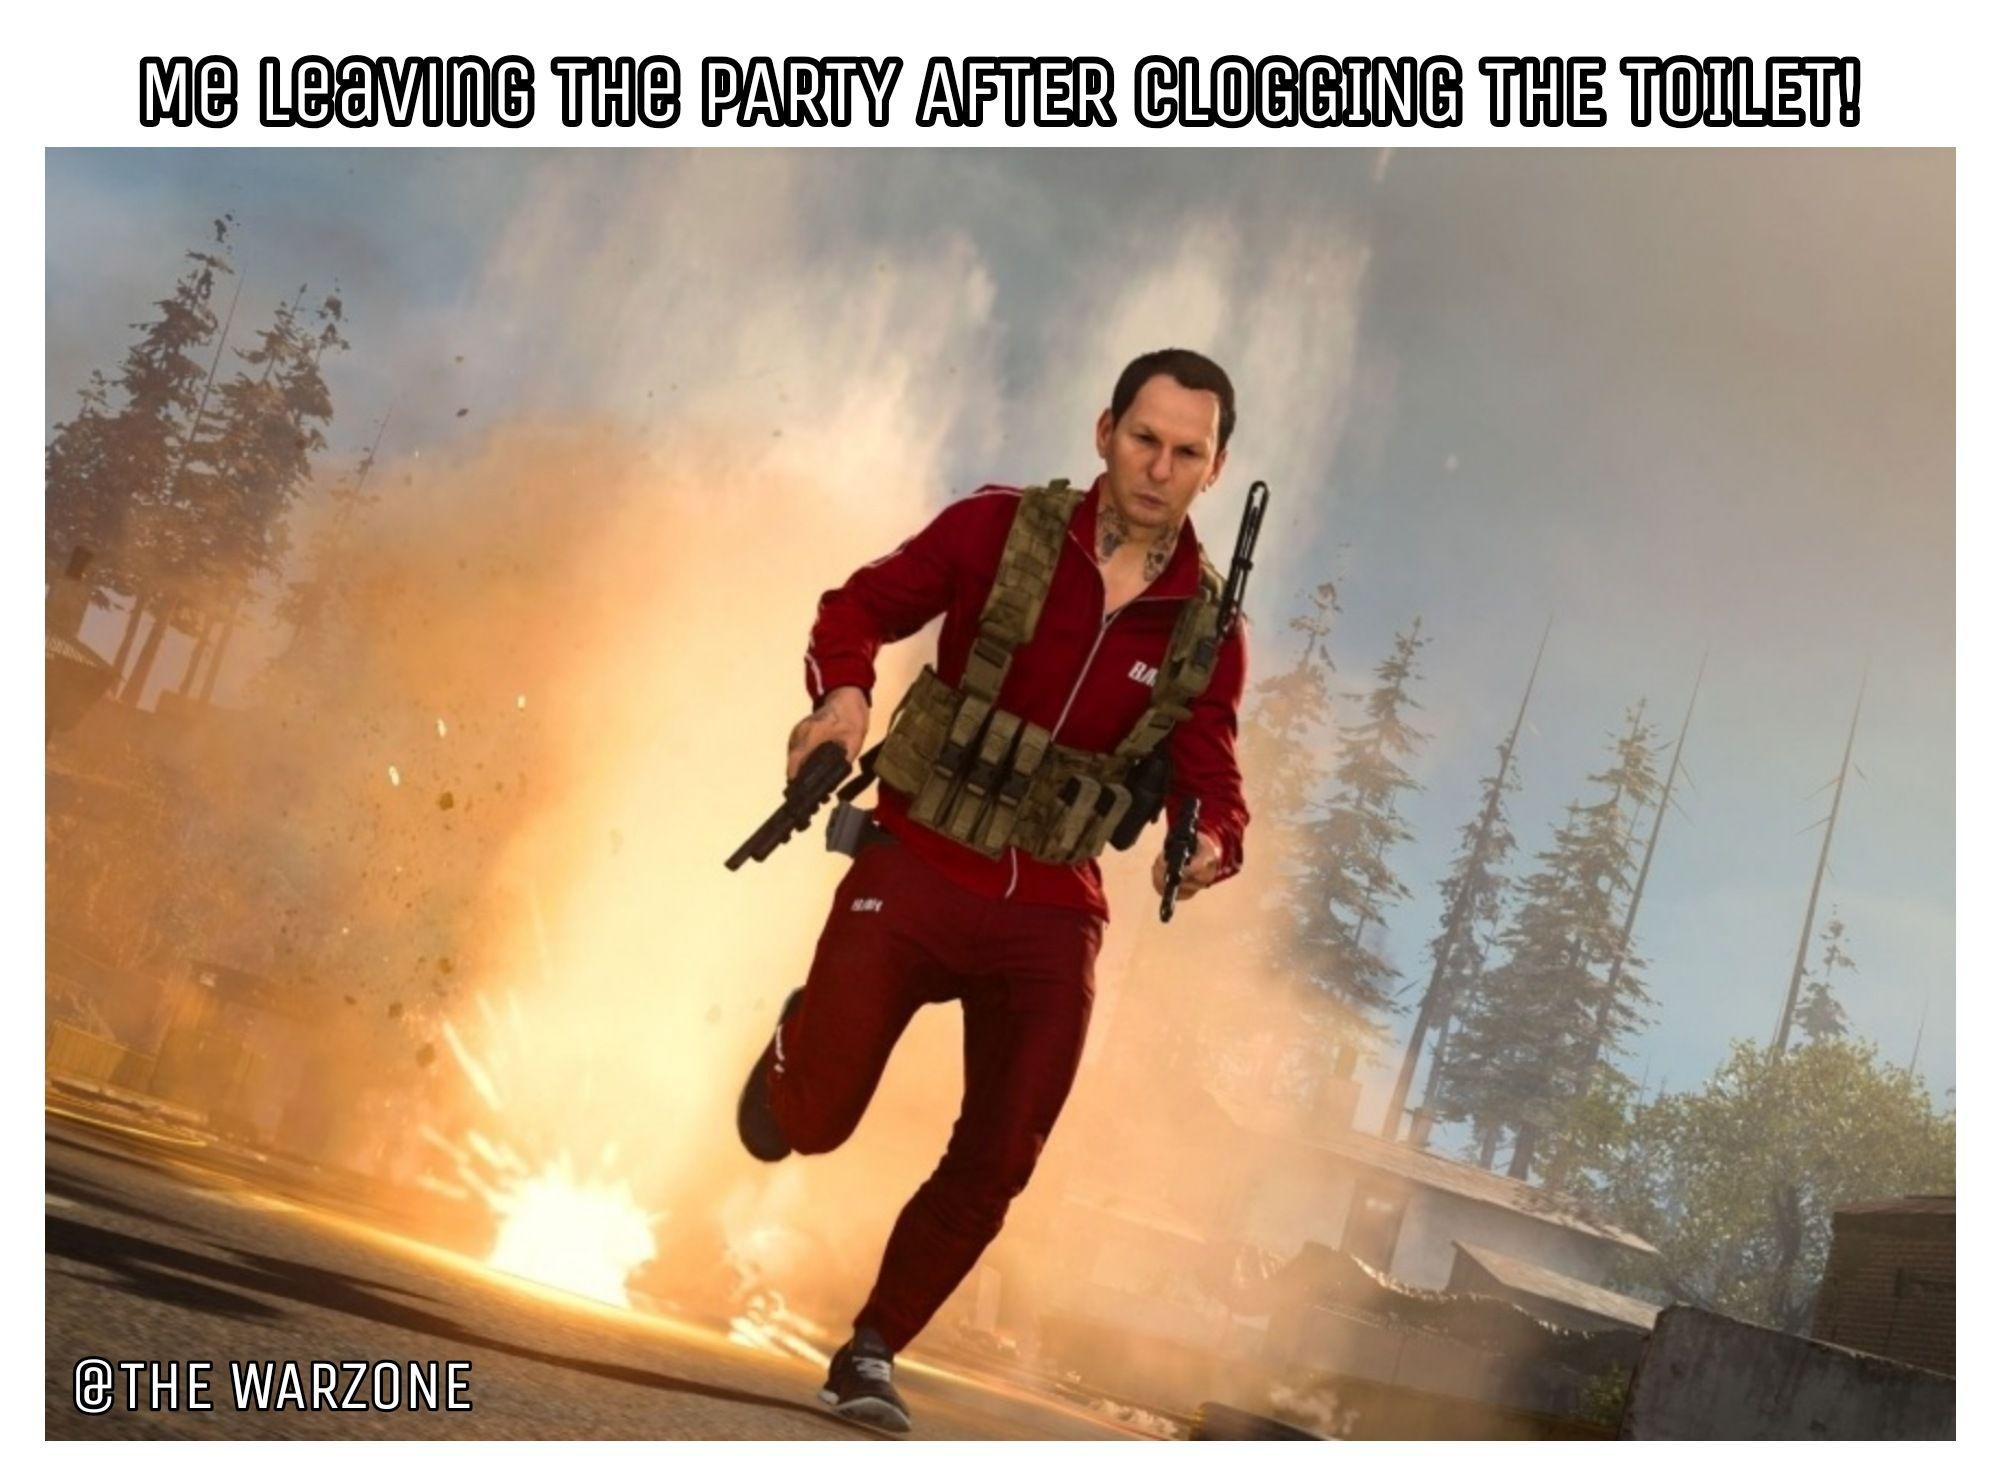 Warzone Memes Warzoned Call Of Duty Memes Gaming Memes Warzone In 2021 Call Of Duty Gaming Memes Cheaters